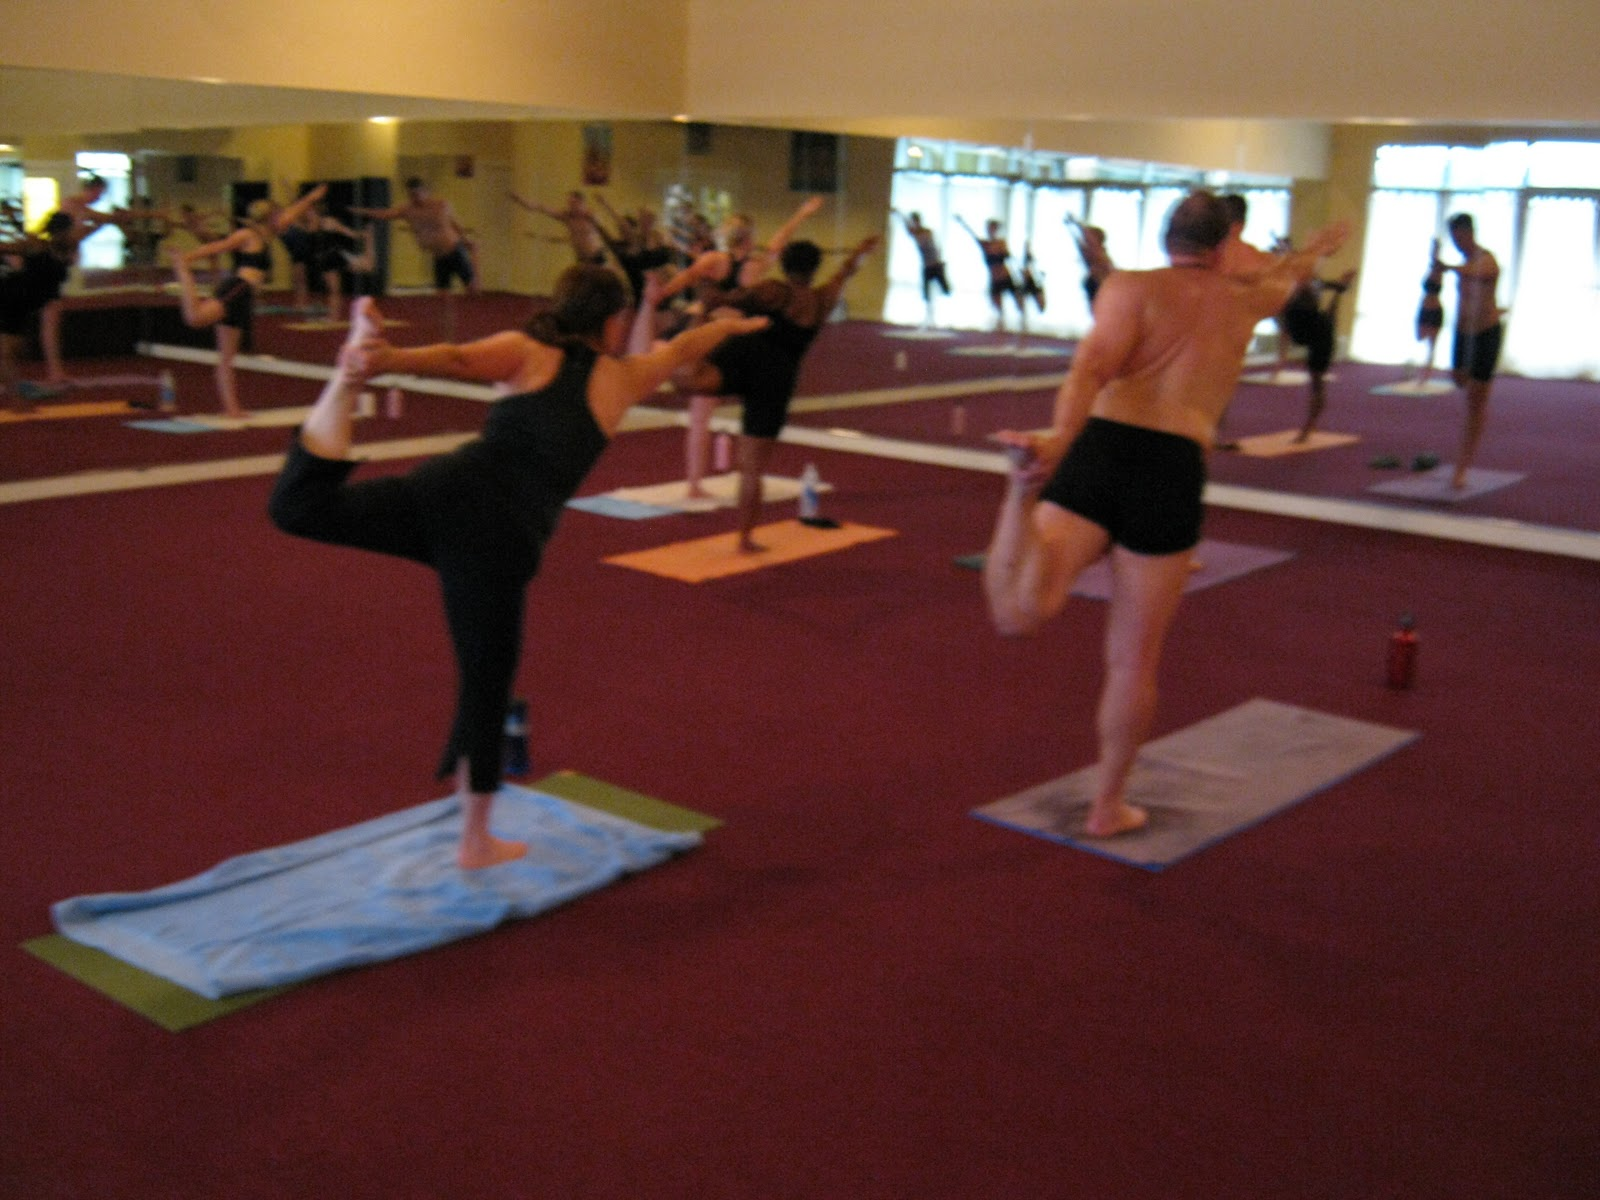 Shoreline Area News Hot Yoga Celebrates Four Years At The Sweatbox In Shoreline